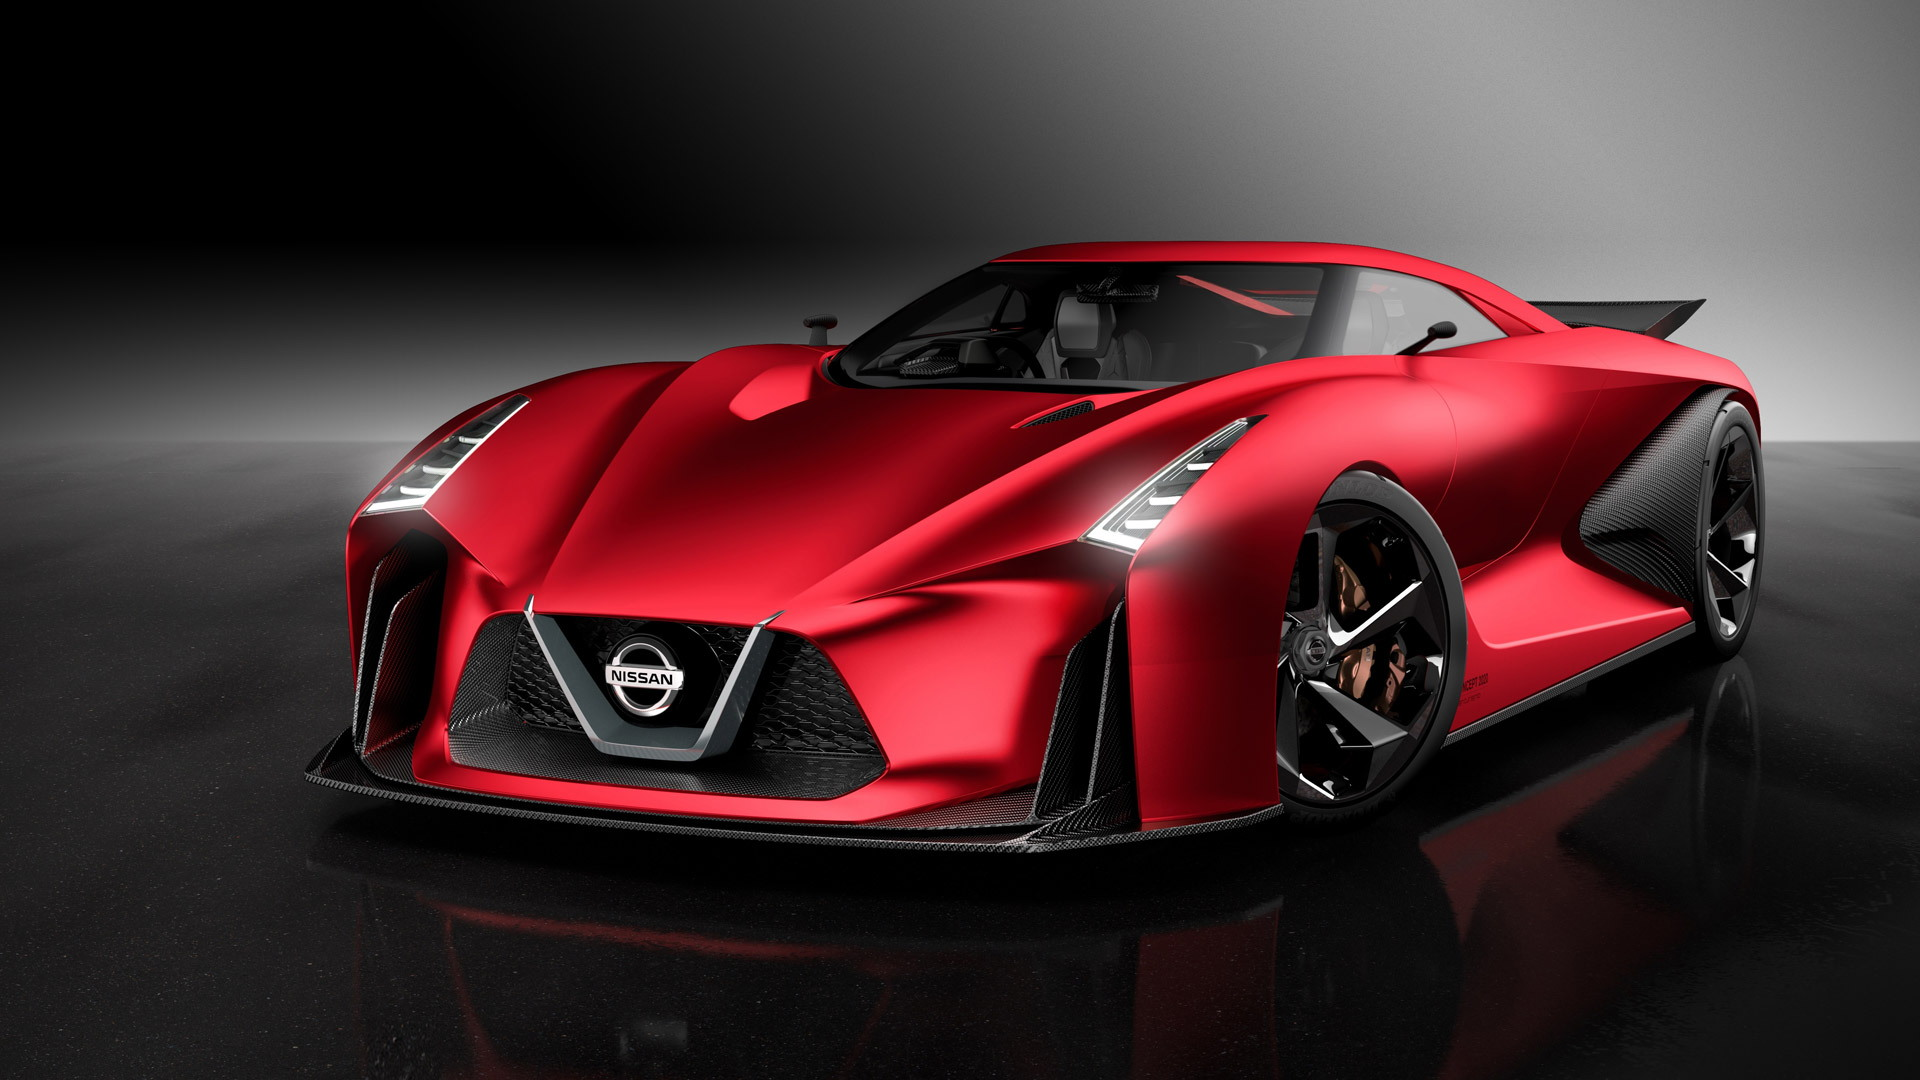 Nissan Concept 2020 Vision Gran Turismo, 2015 Tokyo Motor Show